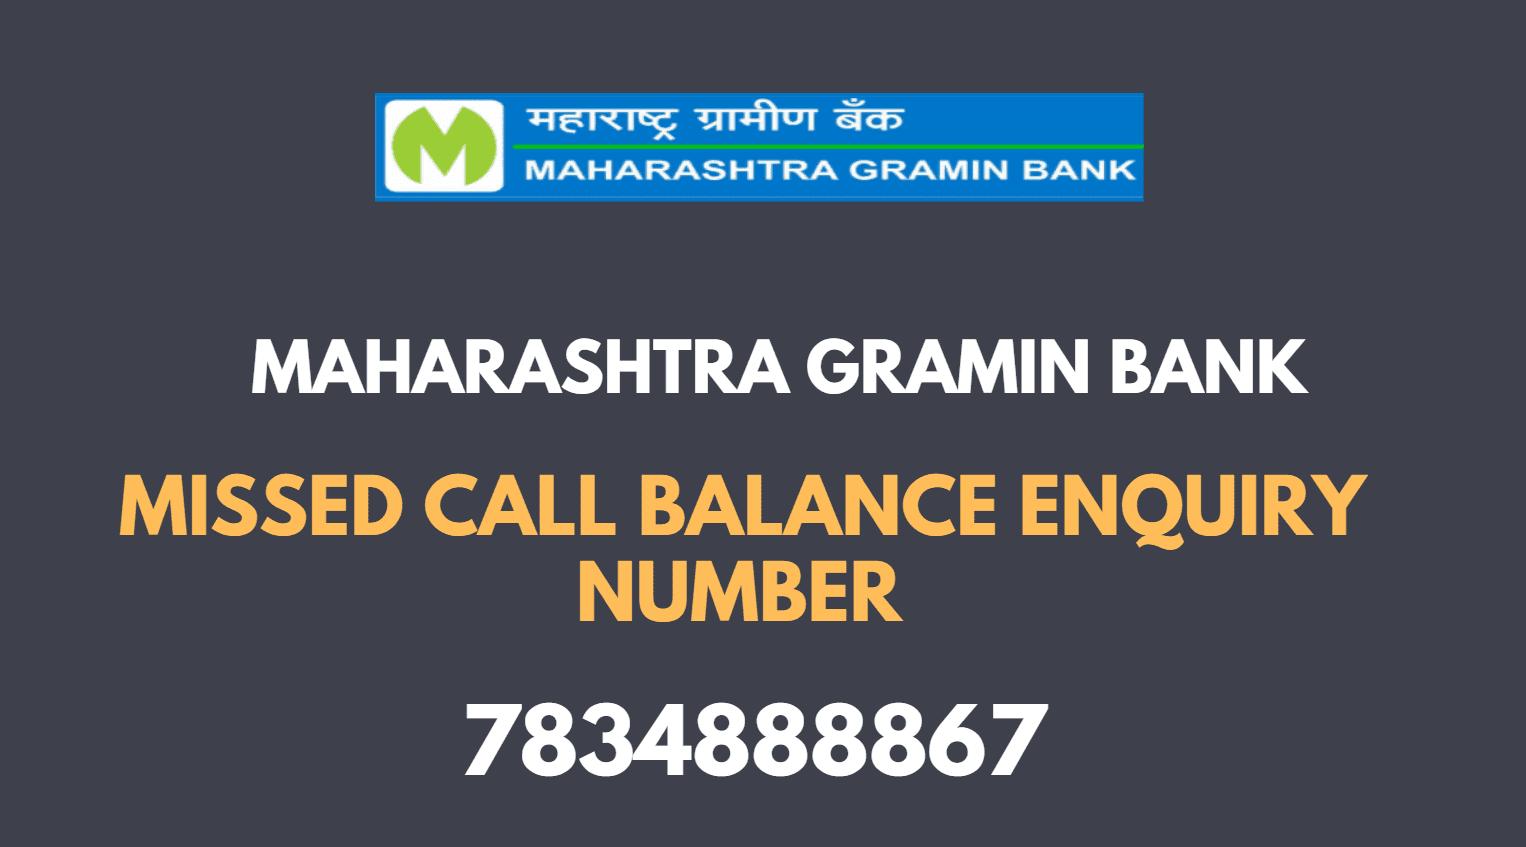 Maharashtra Gramin Bank missed call Balance Enquiry Number